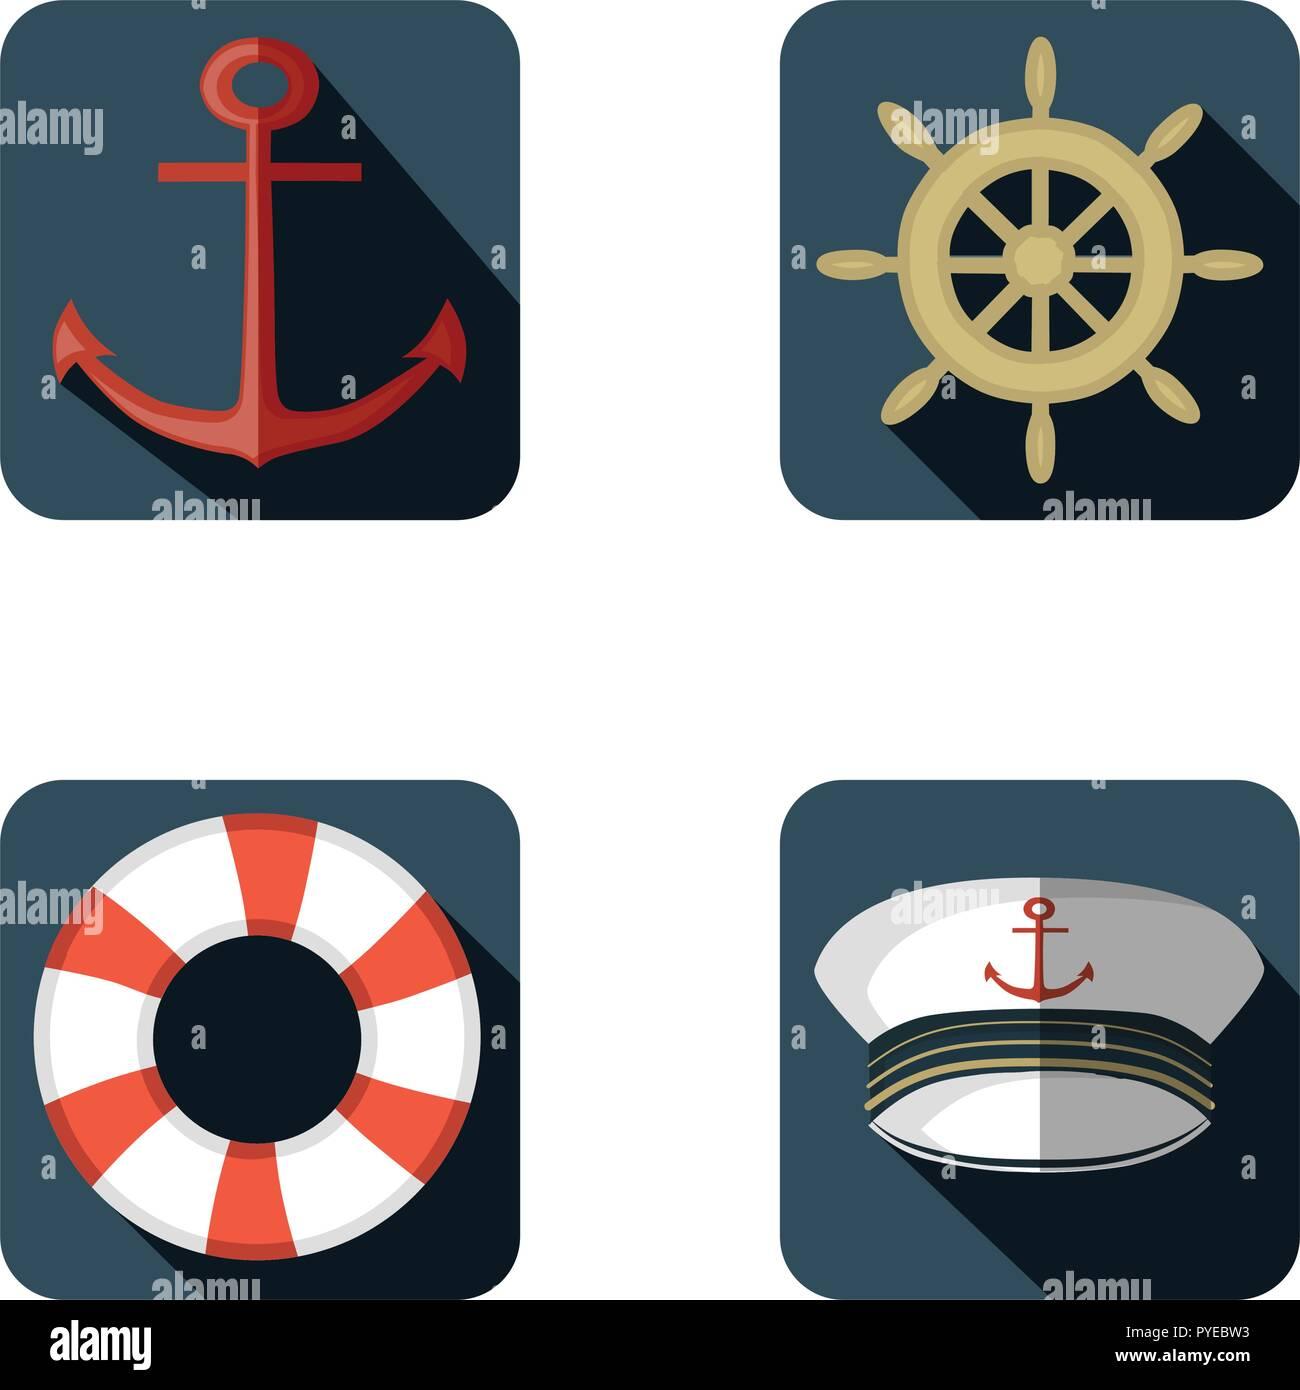 Navy icon set, flat design, vector illustration - Stock Image